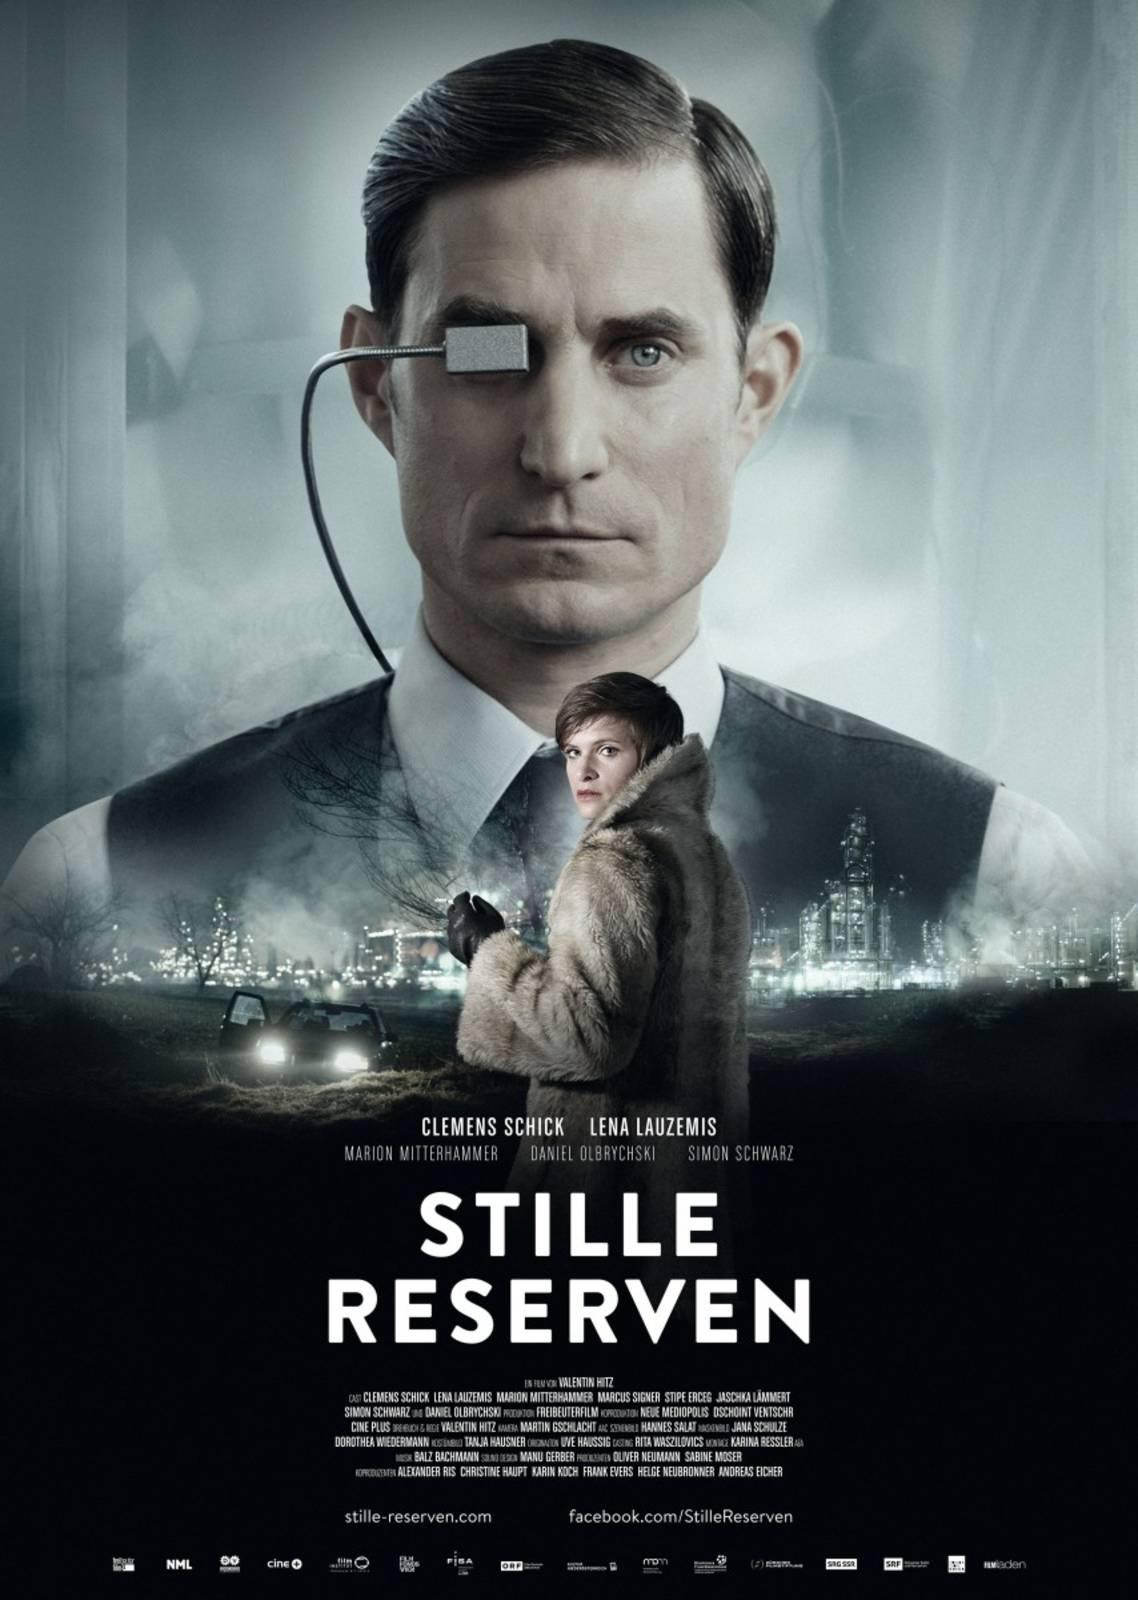 Stille Reserven (Film)